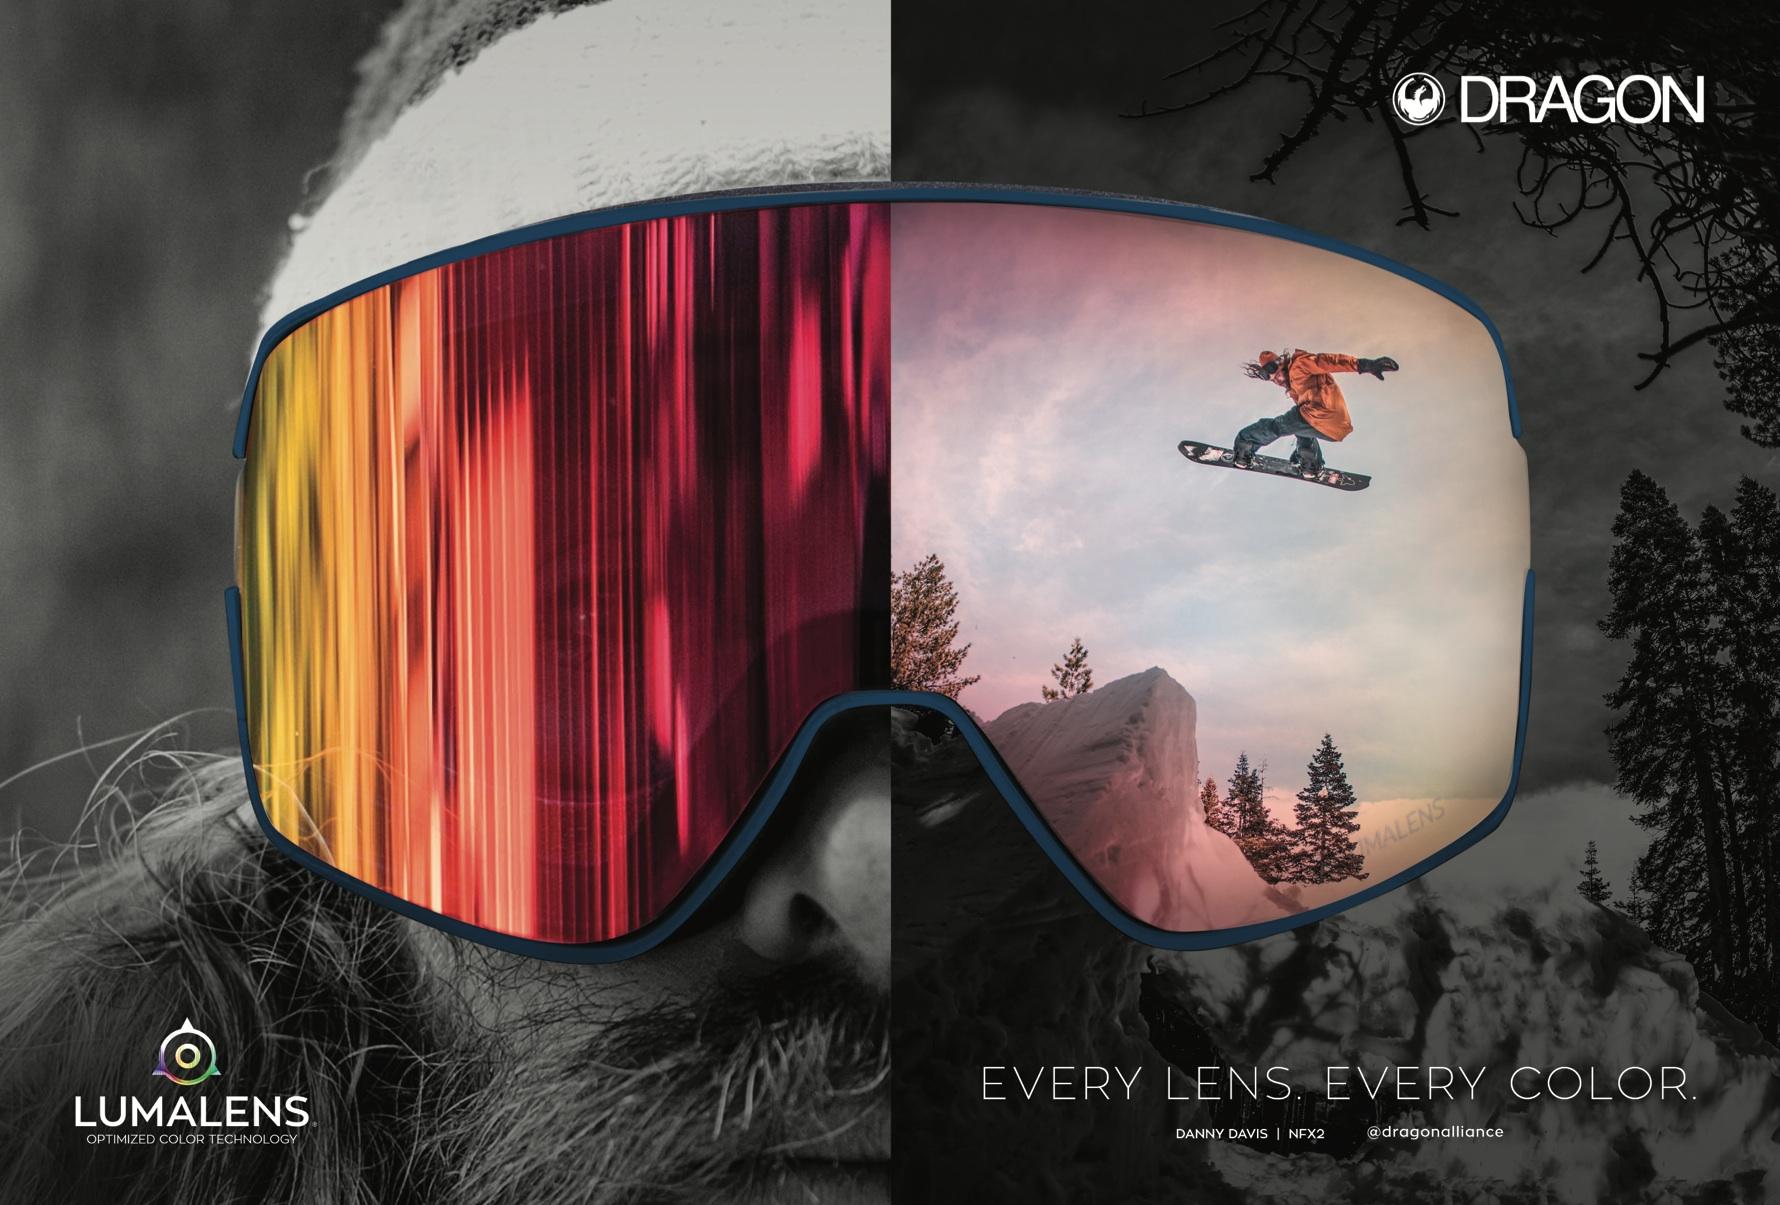 88 Dragon Sunglasses